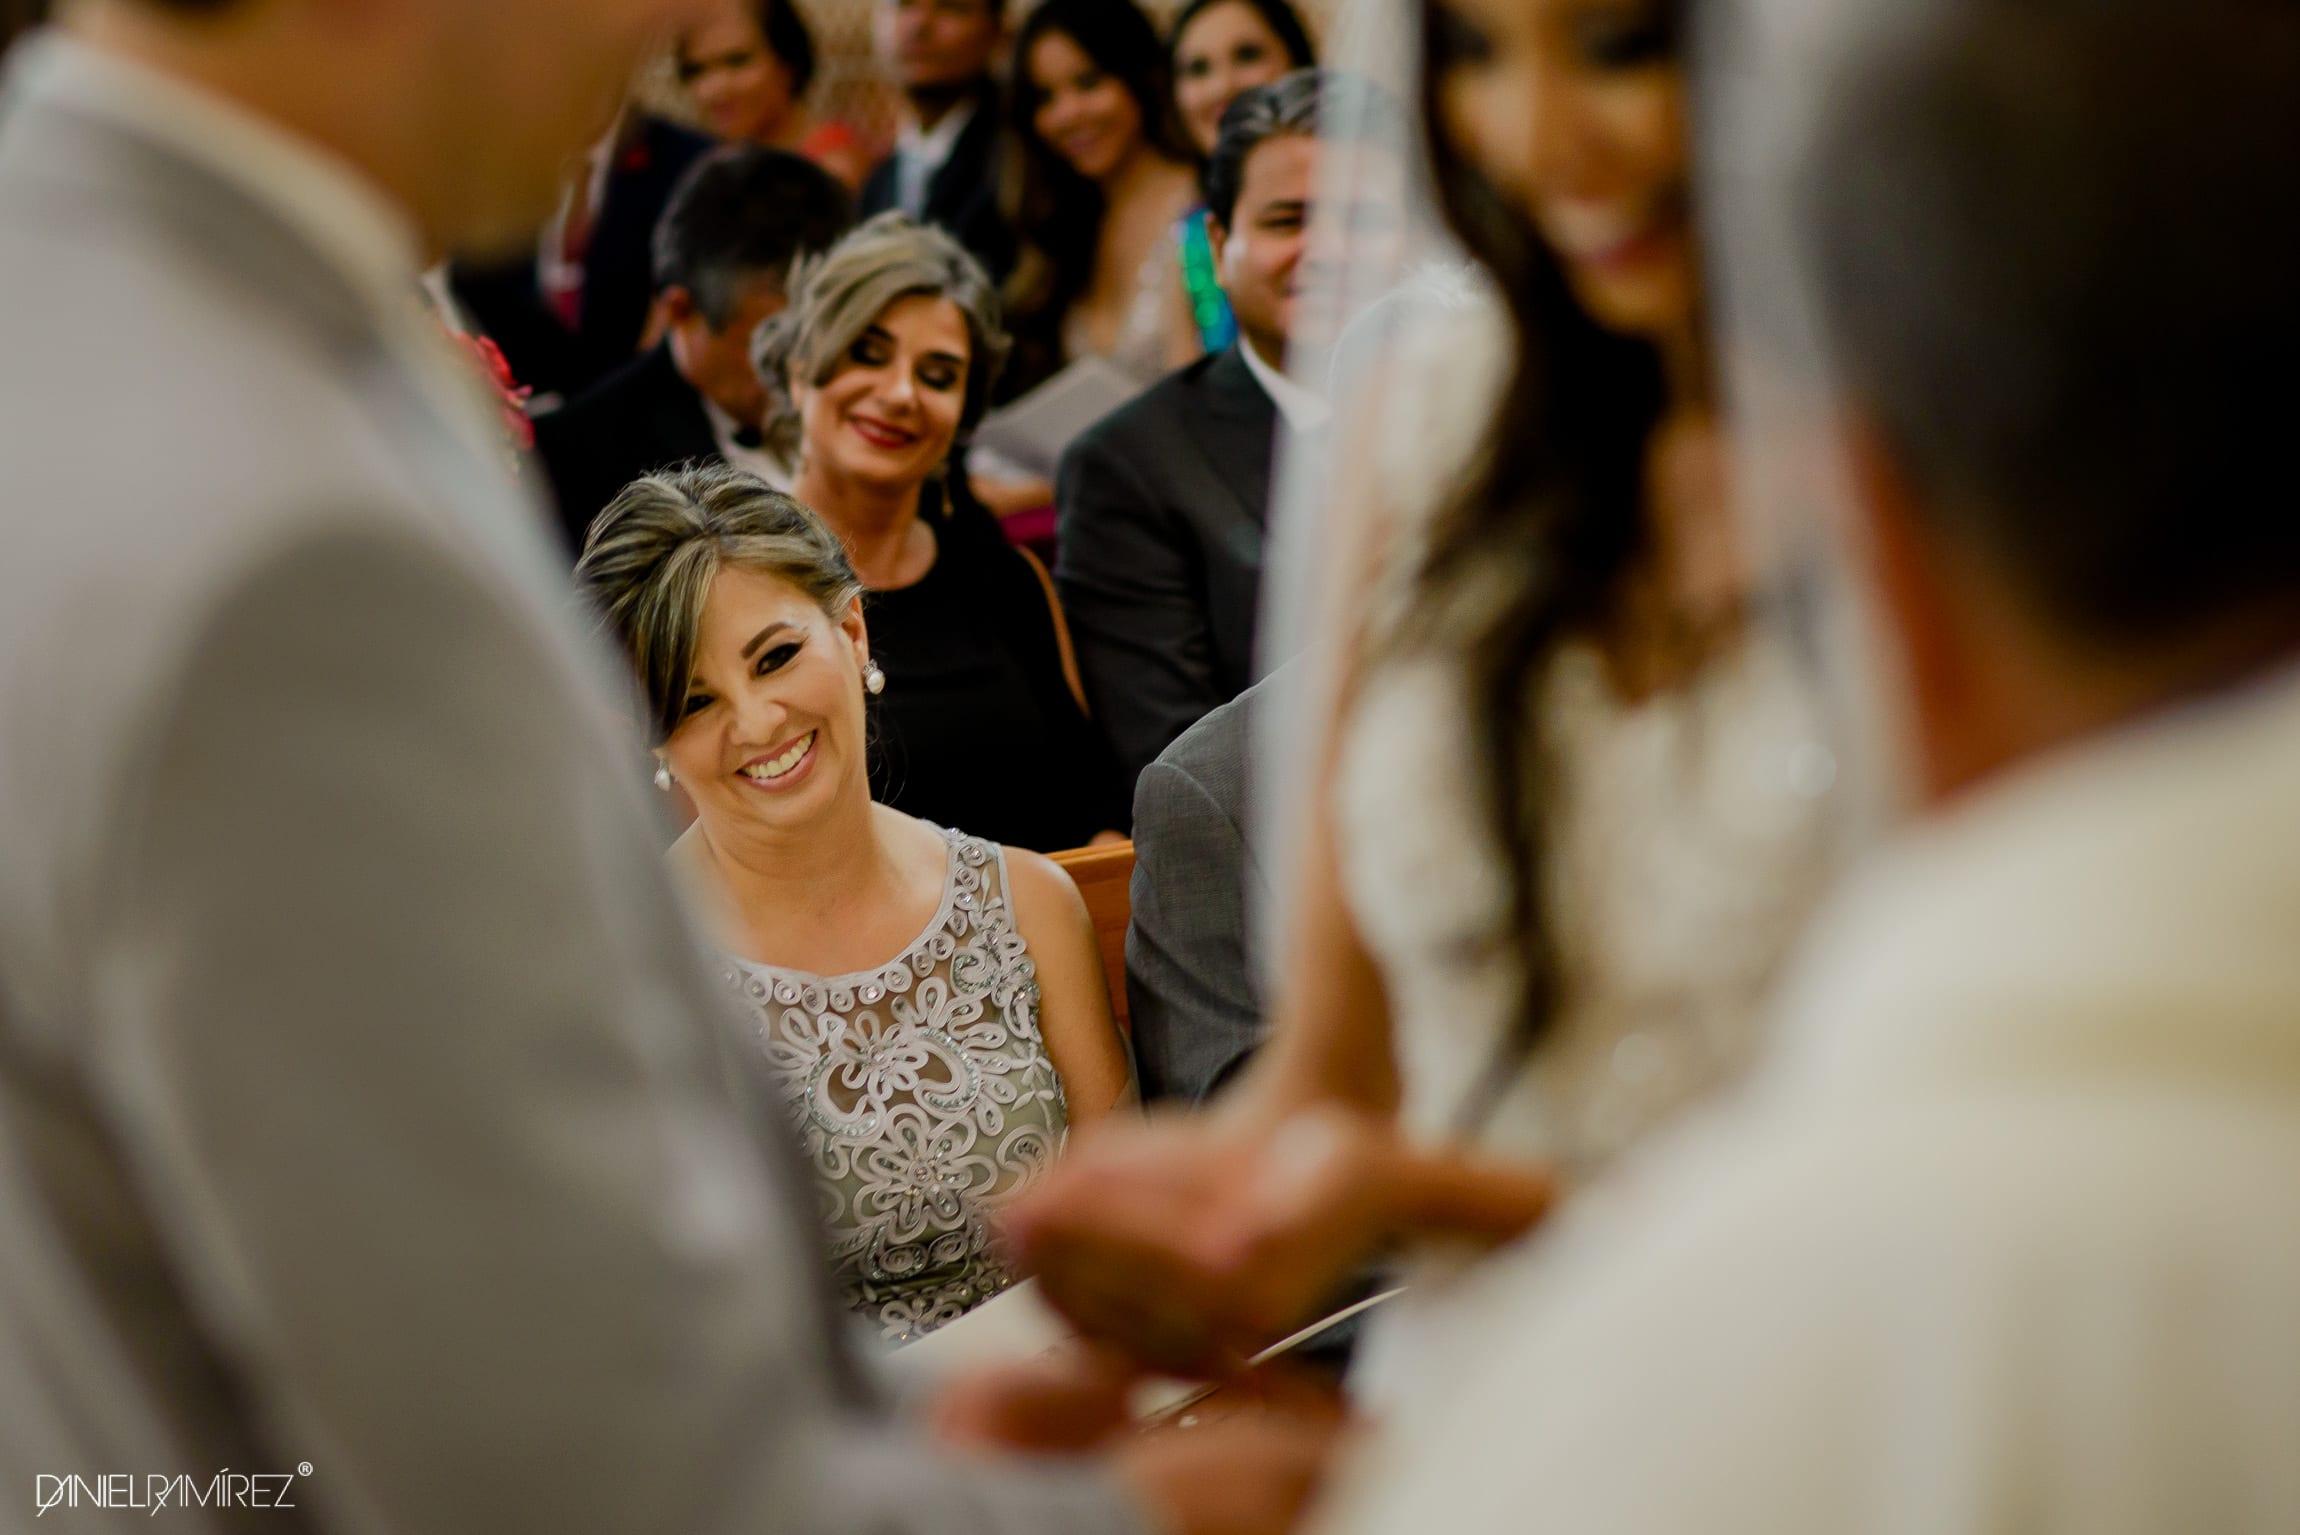 penzi wedding and events